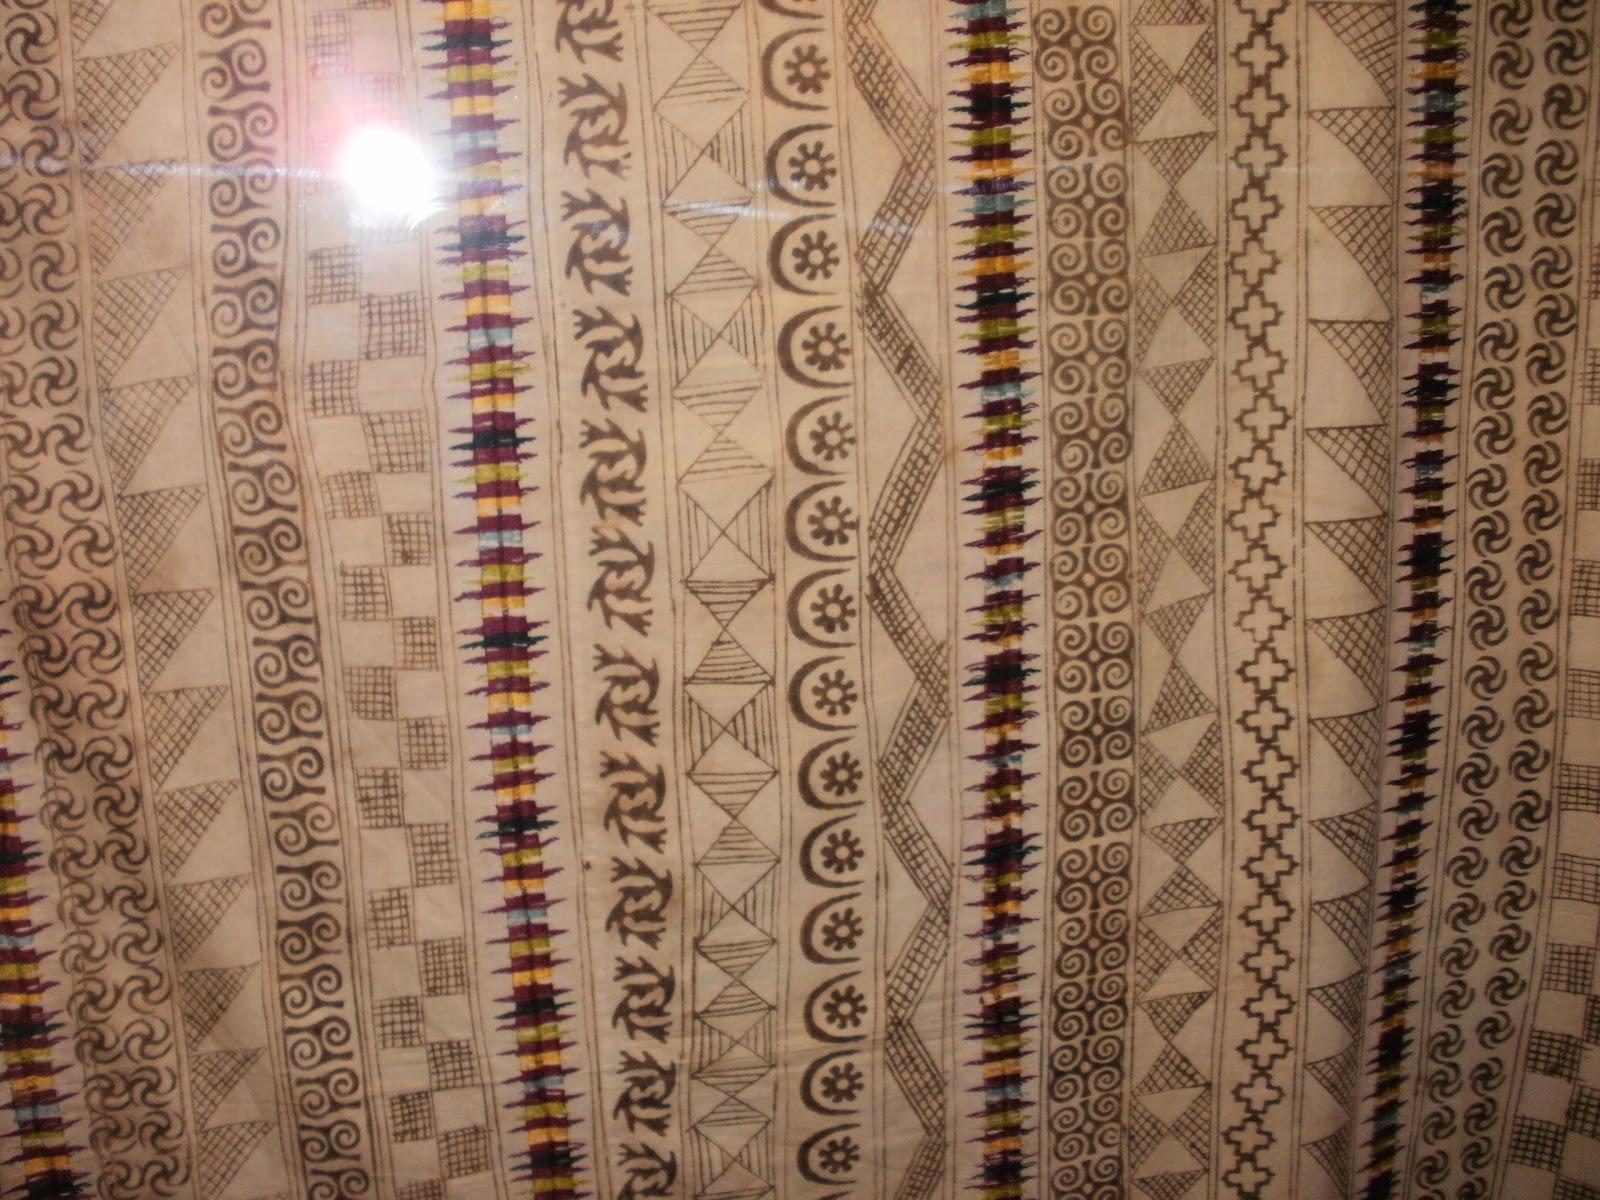 http://3.bp.blogspot.com/-1PysOrUthl0/UE9v-3A5VsI/AAAAAAAAA8M/G8Tu5Z0L_M4/s1600/7+adindra+cloth+1970.jpg